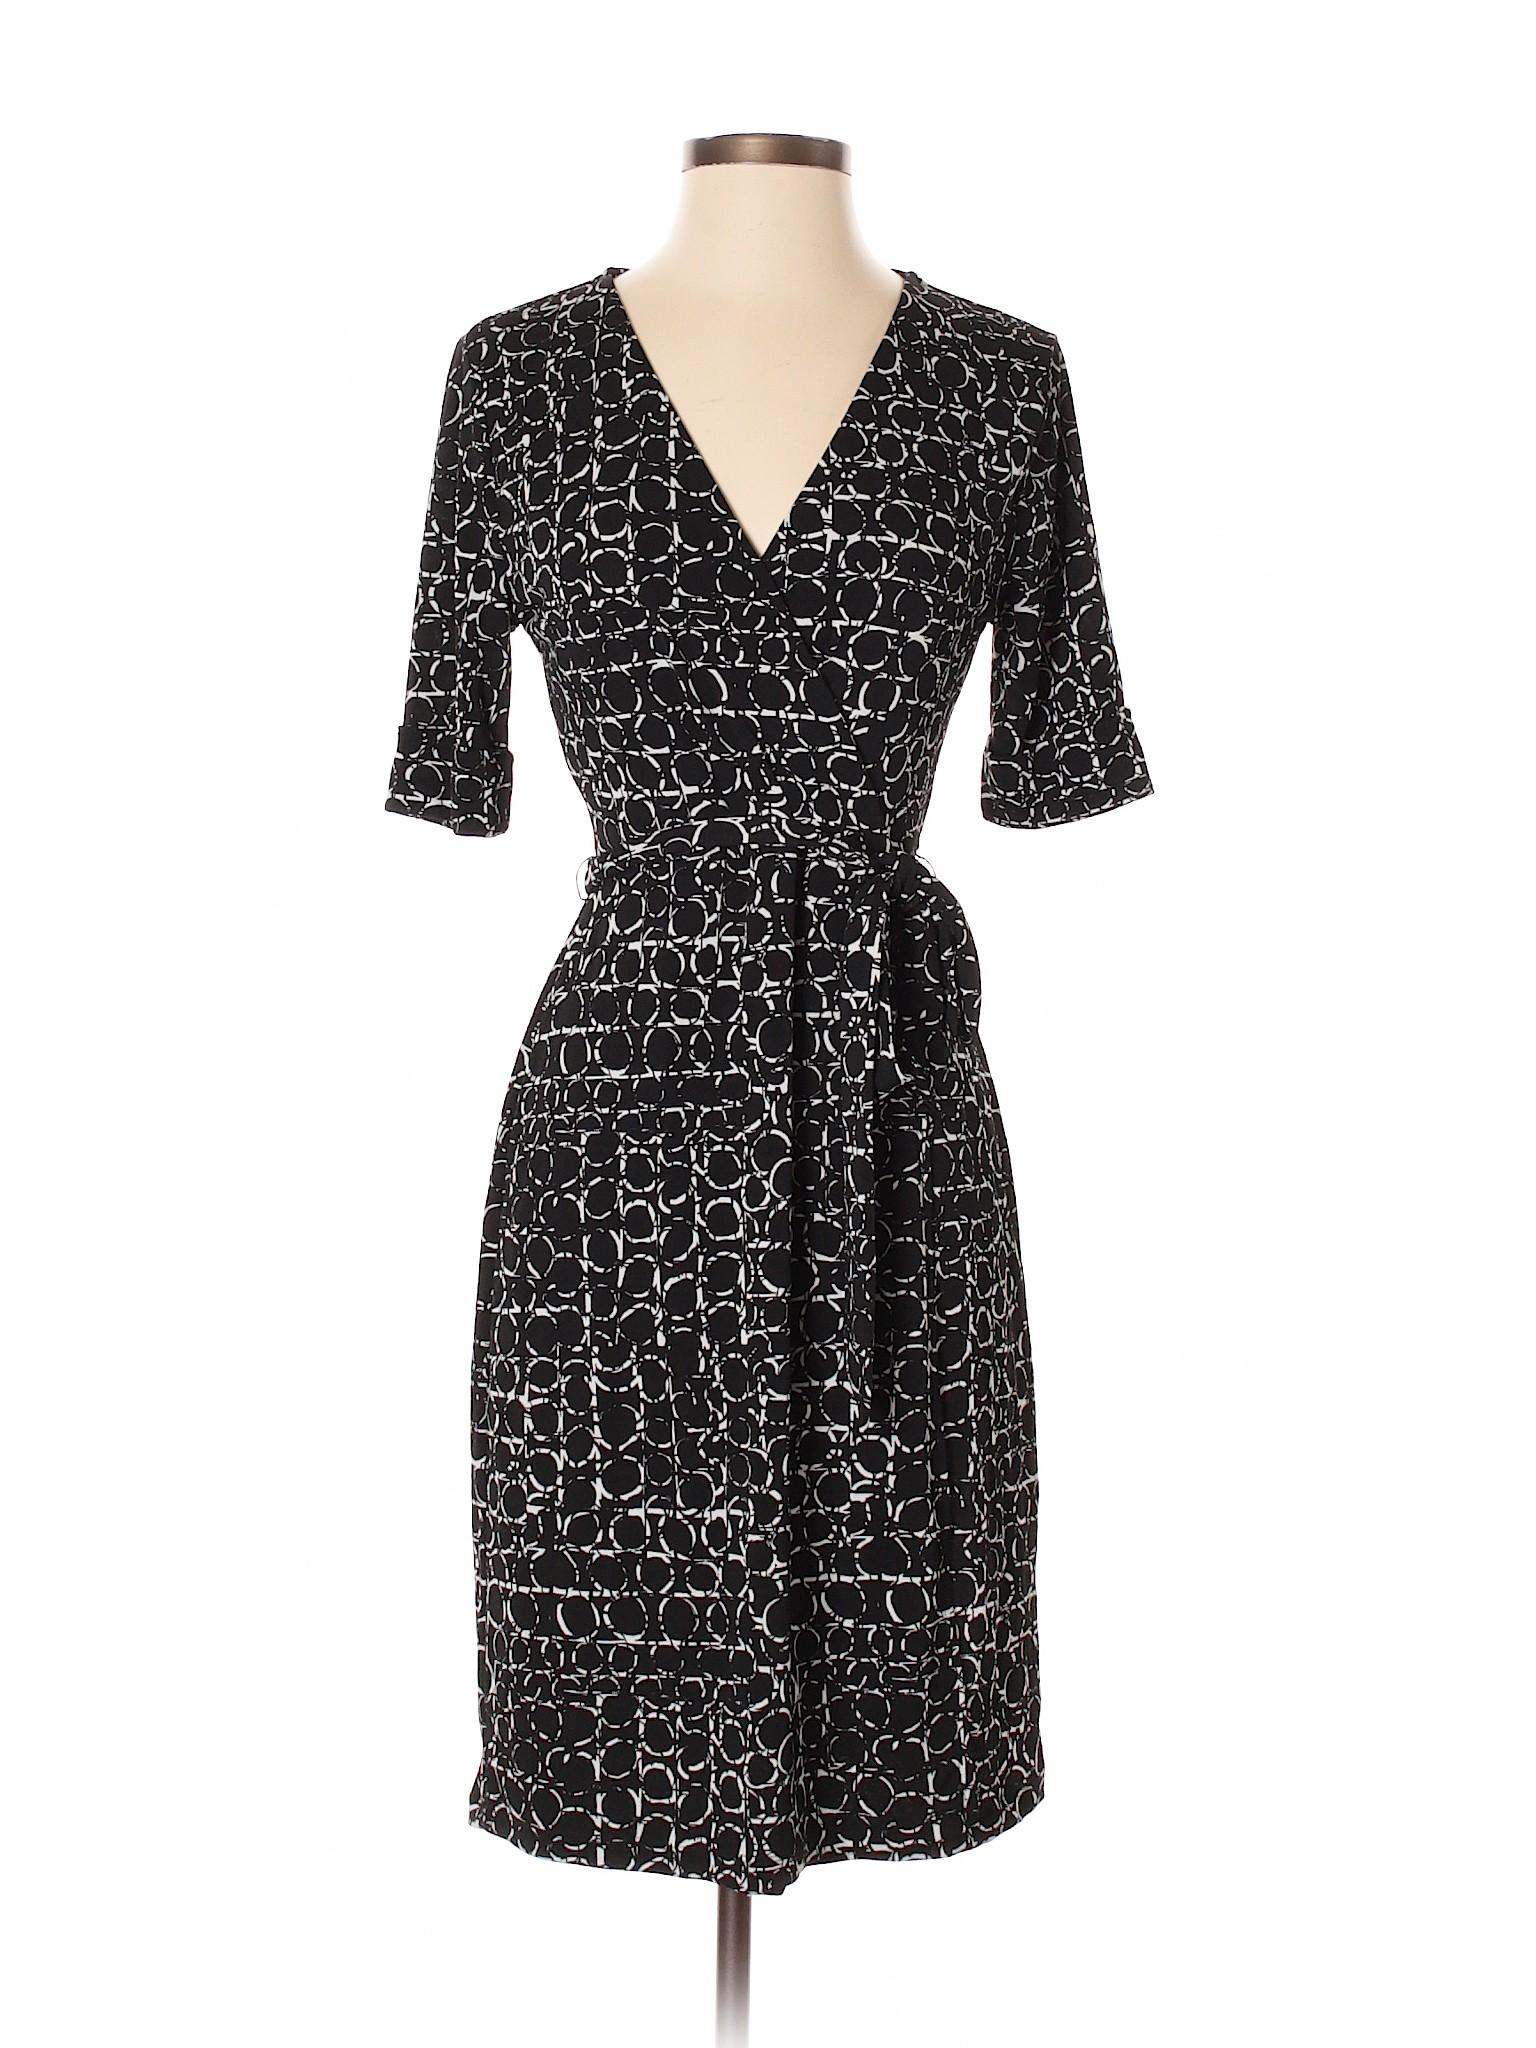 Apt Casual winter Boutique Dress 9 48xOCR1Wwq